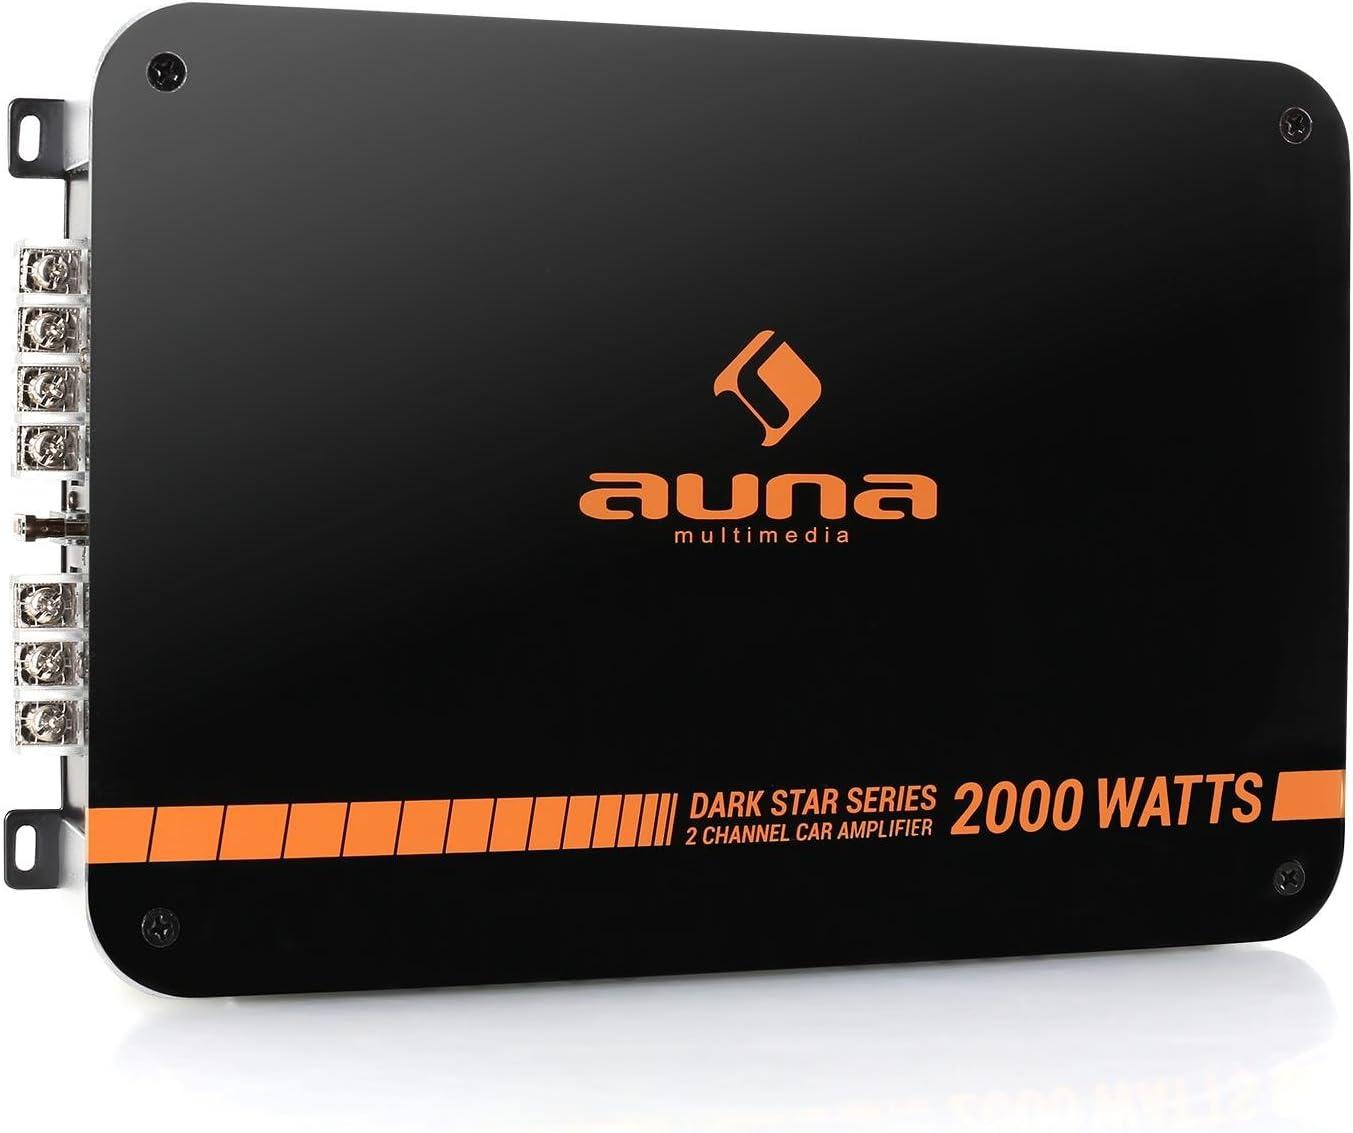 Auna Dark Star 2000 Hifi Verstärker Mit 2000 Watt New Elektronik